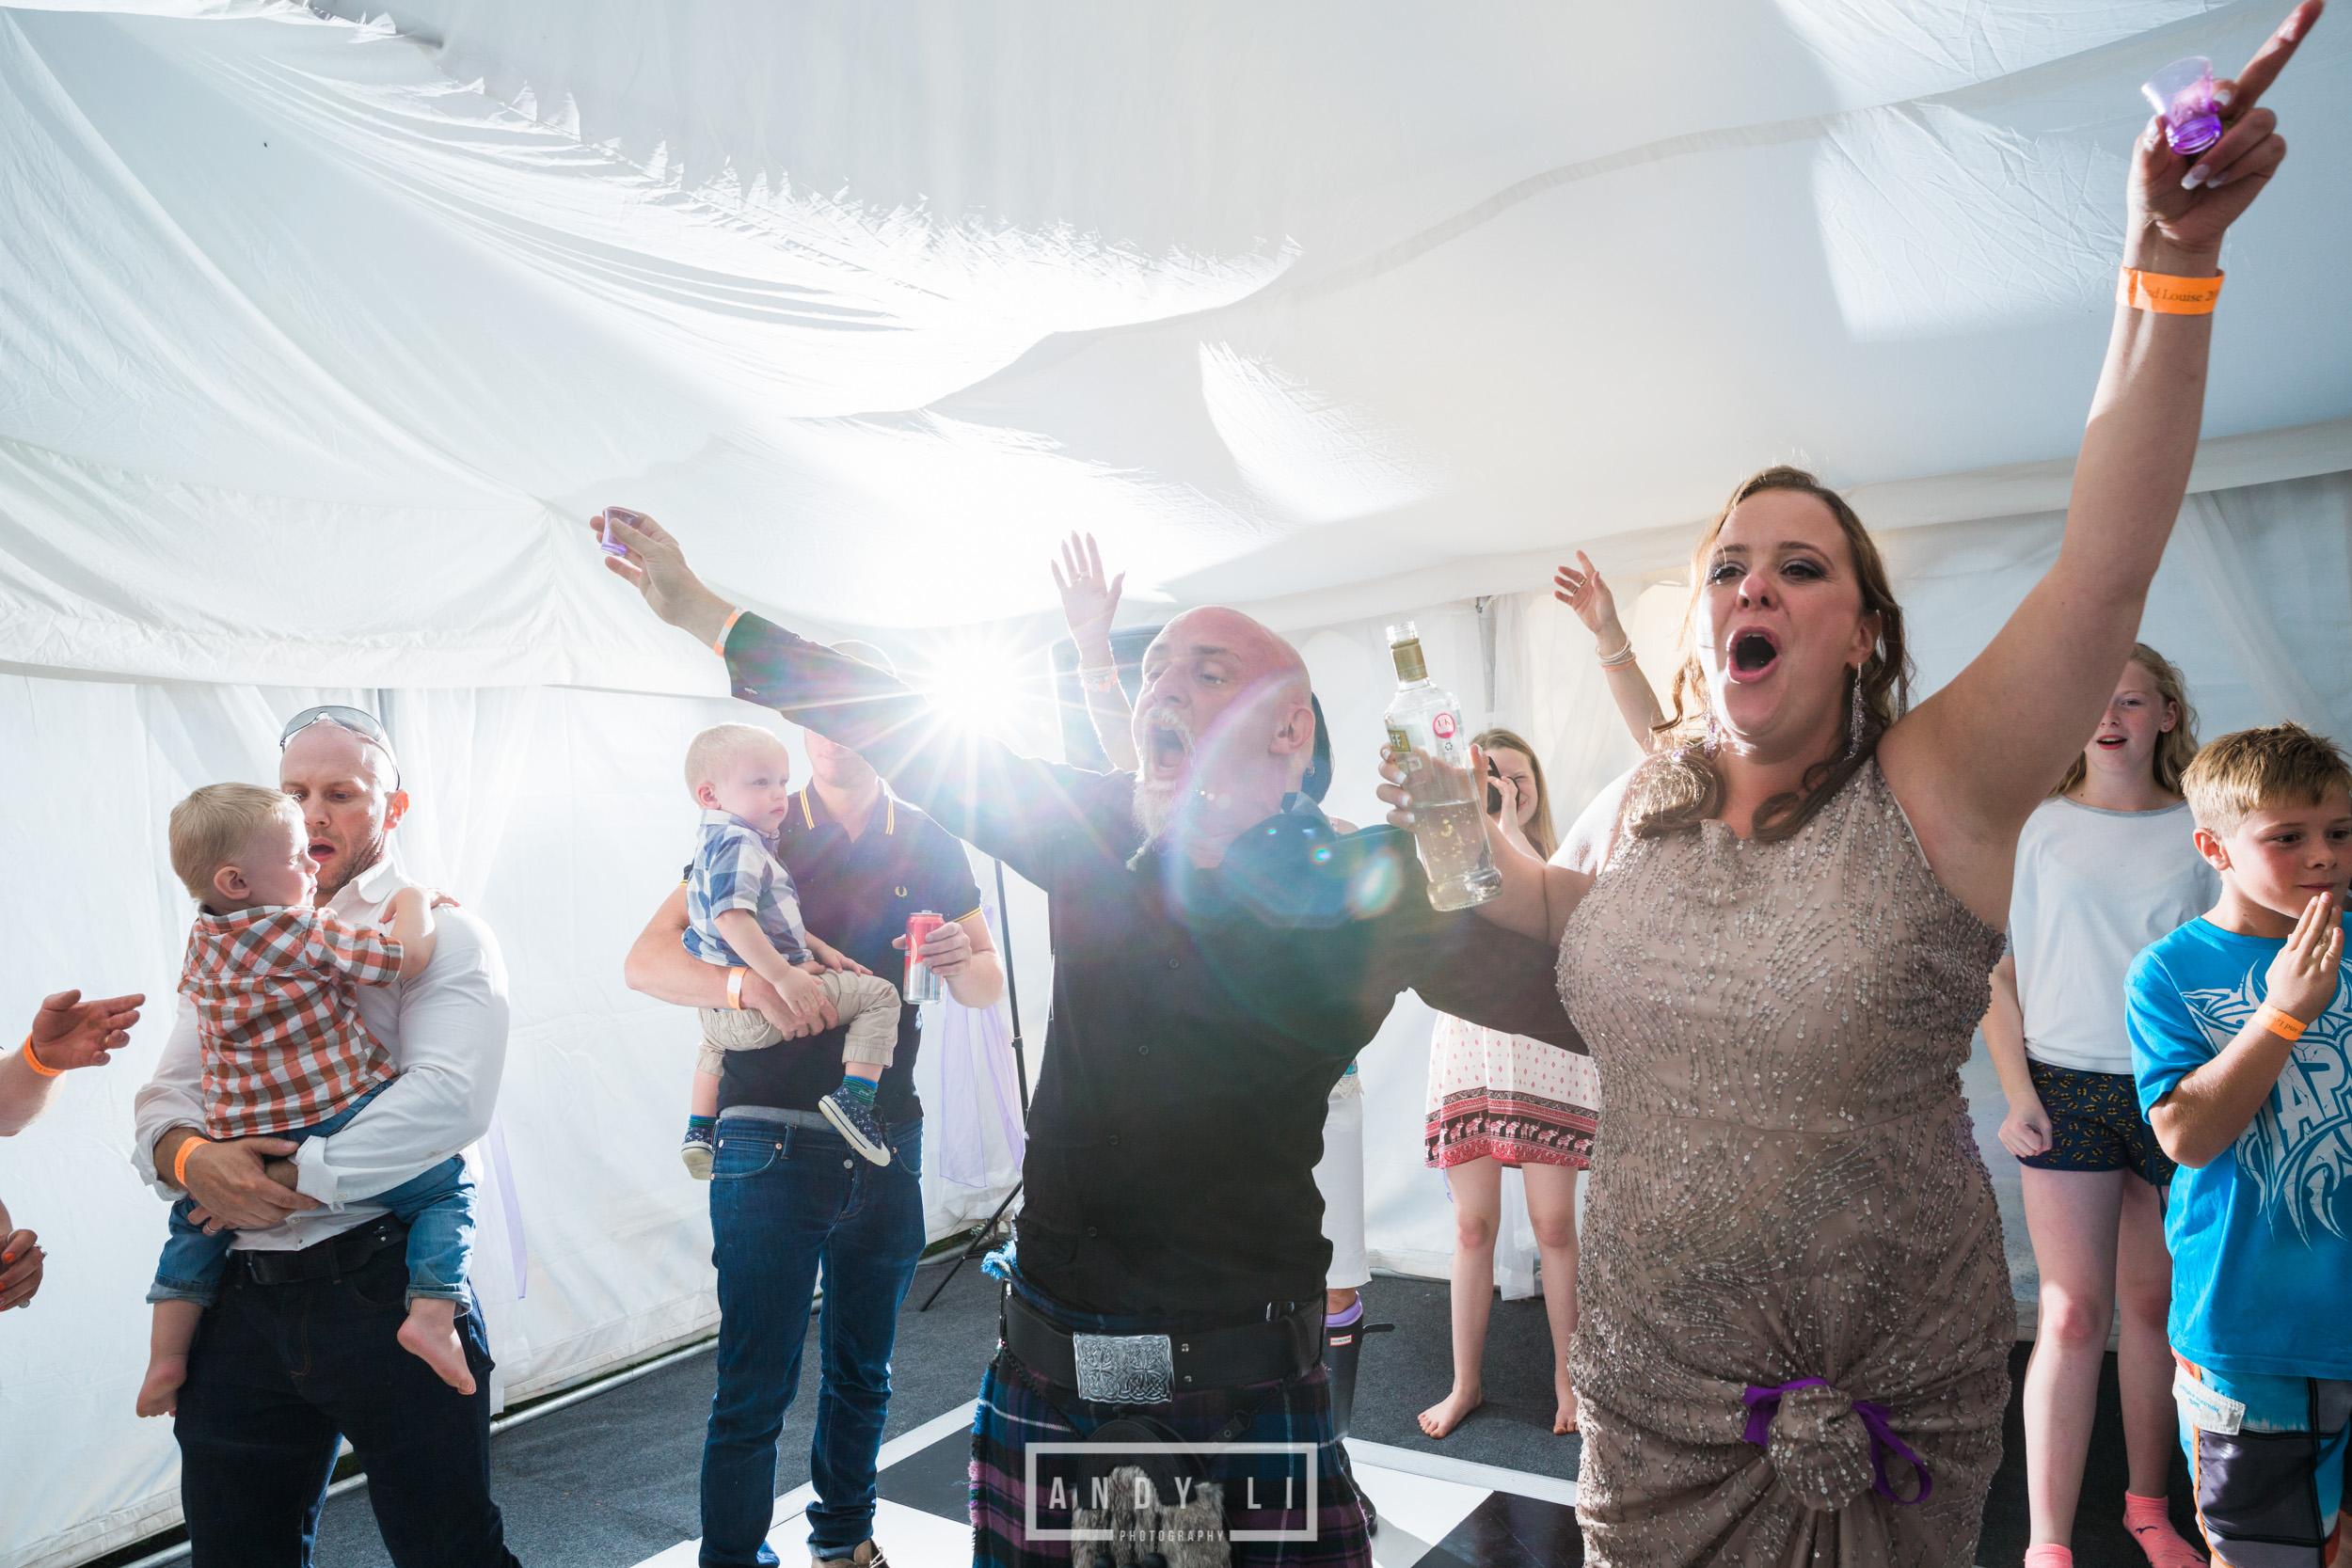 Festival Wedding Shropshire-Andy Li Photography-469.jpg